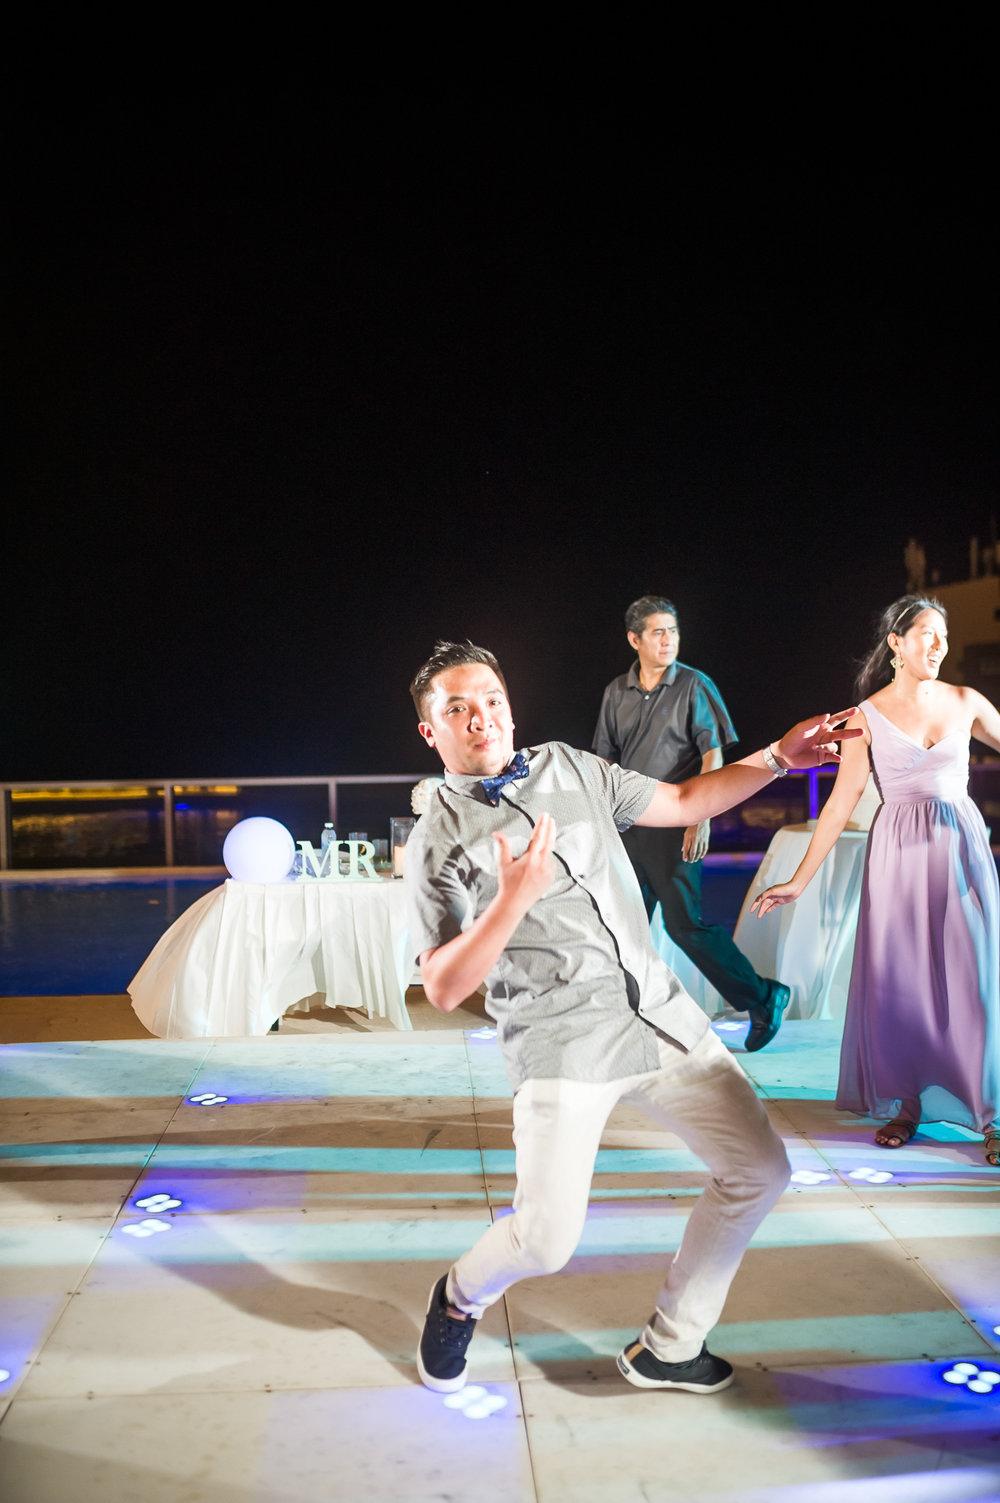 44-David Loi Studios - Cancun - Mexico - Destination Wedding-26143.jpg